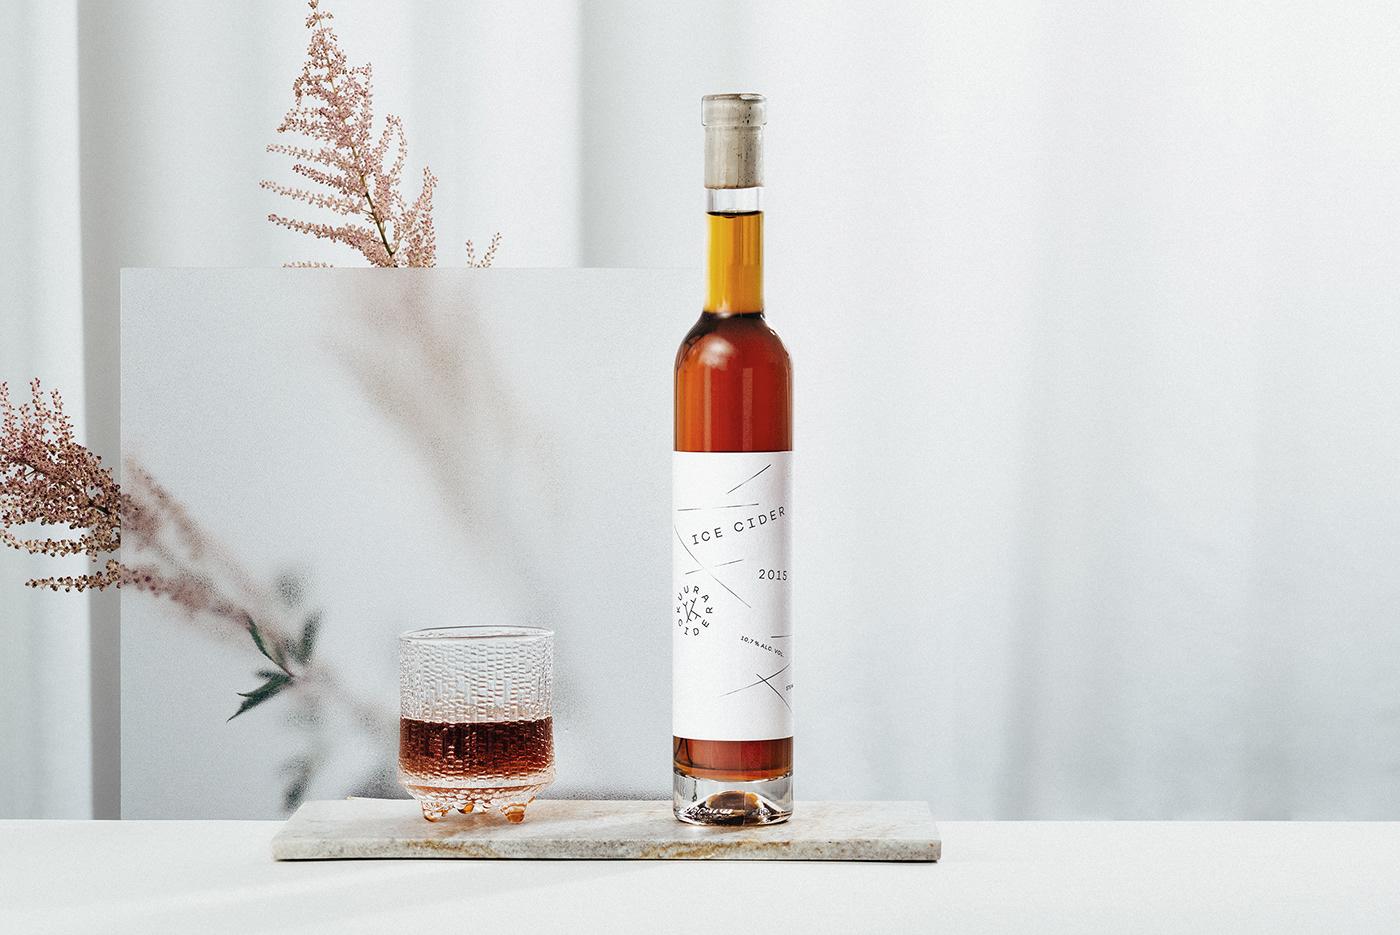 Label cider Scandinavian artisanal label design minimalistic Hot Foil